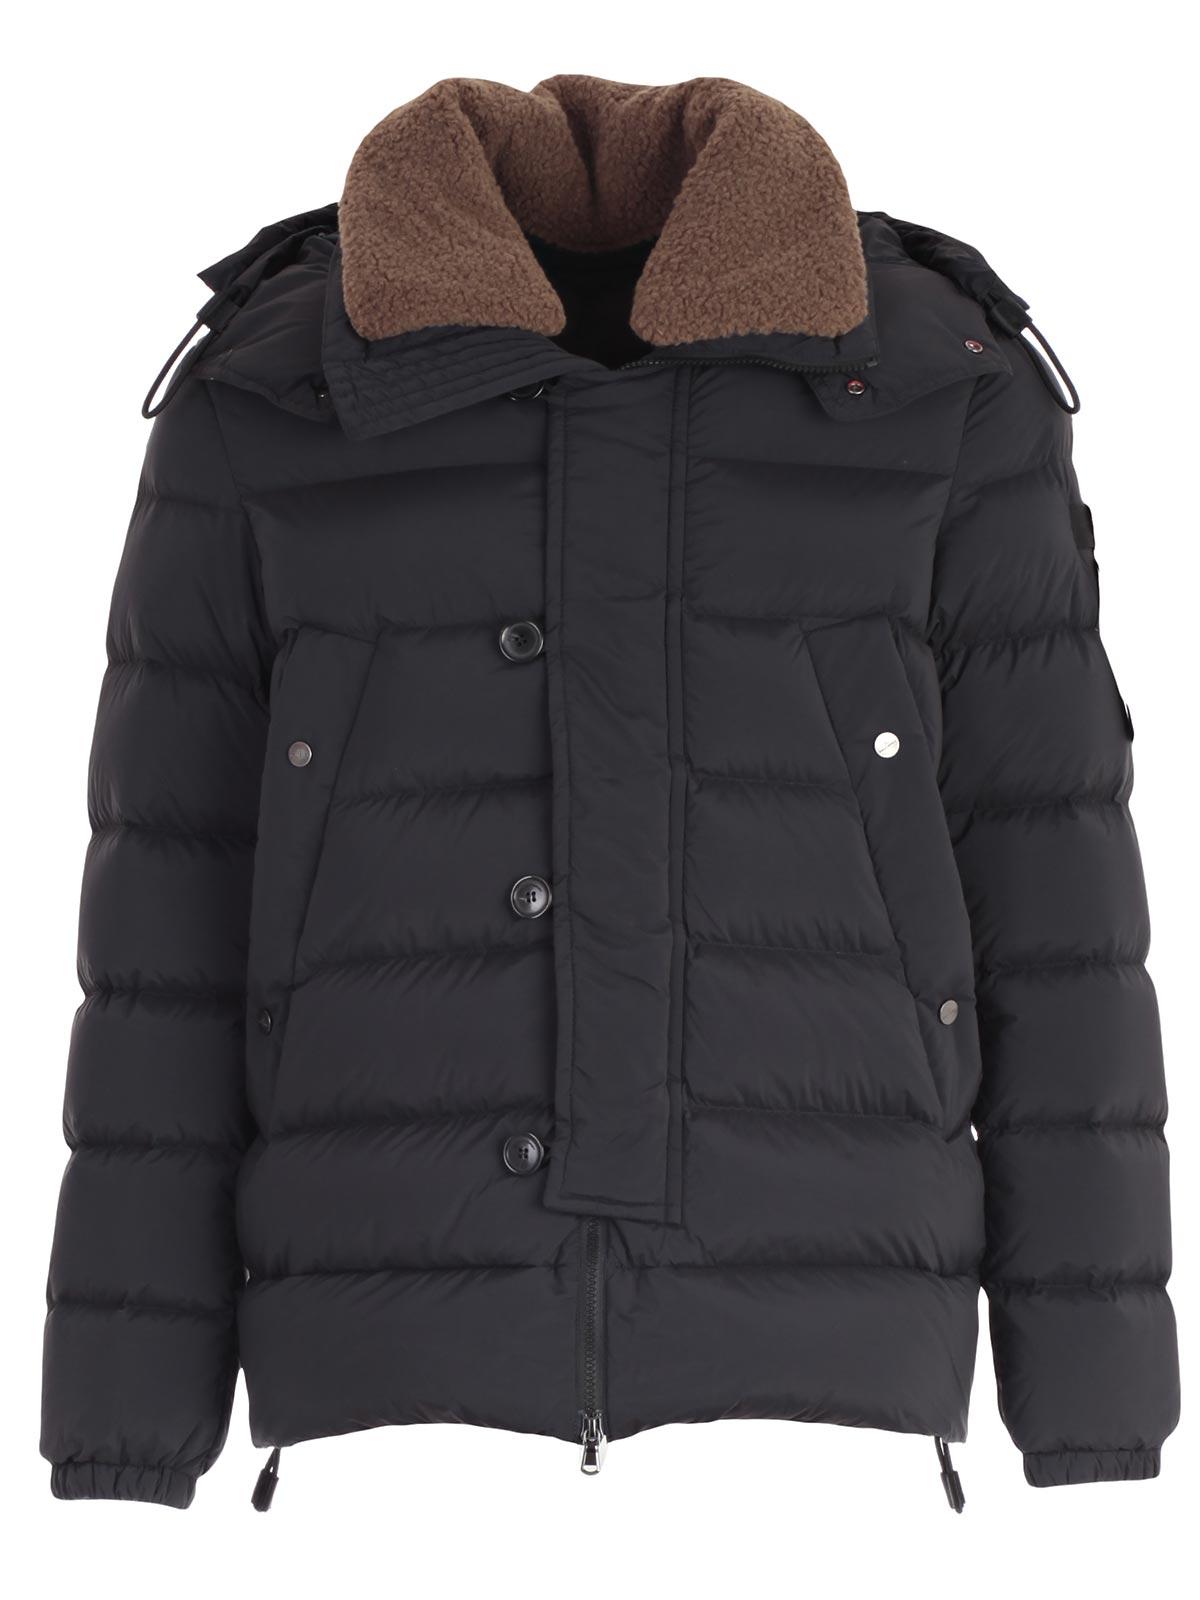 timeless design 54940 b4bb0 Peuterey Jacket